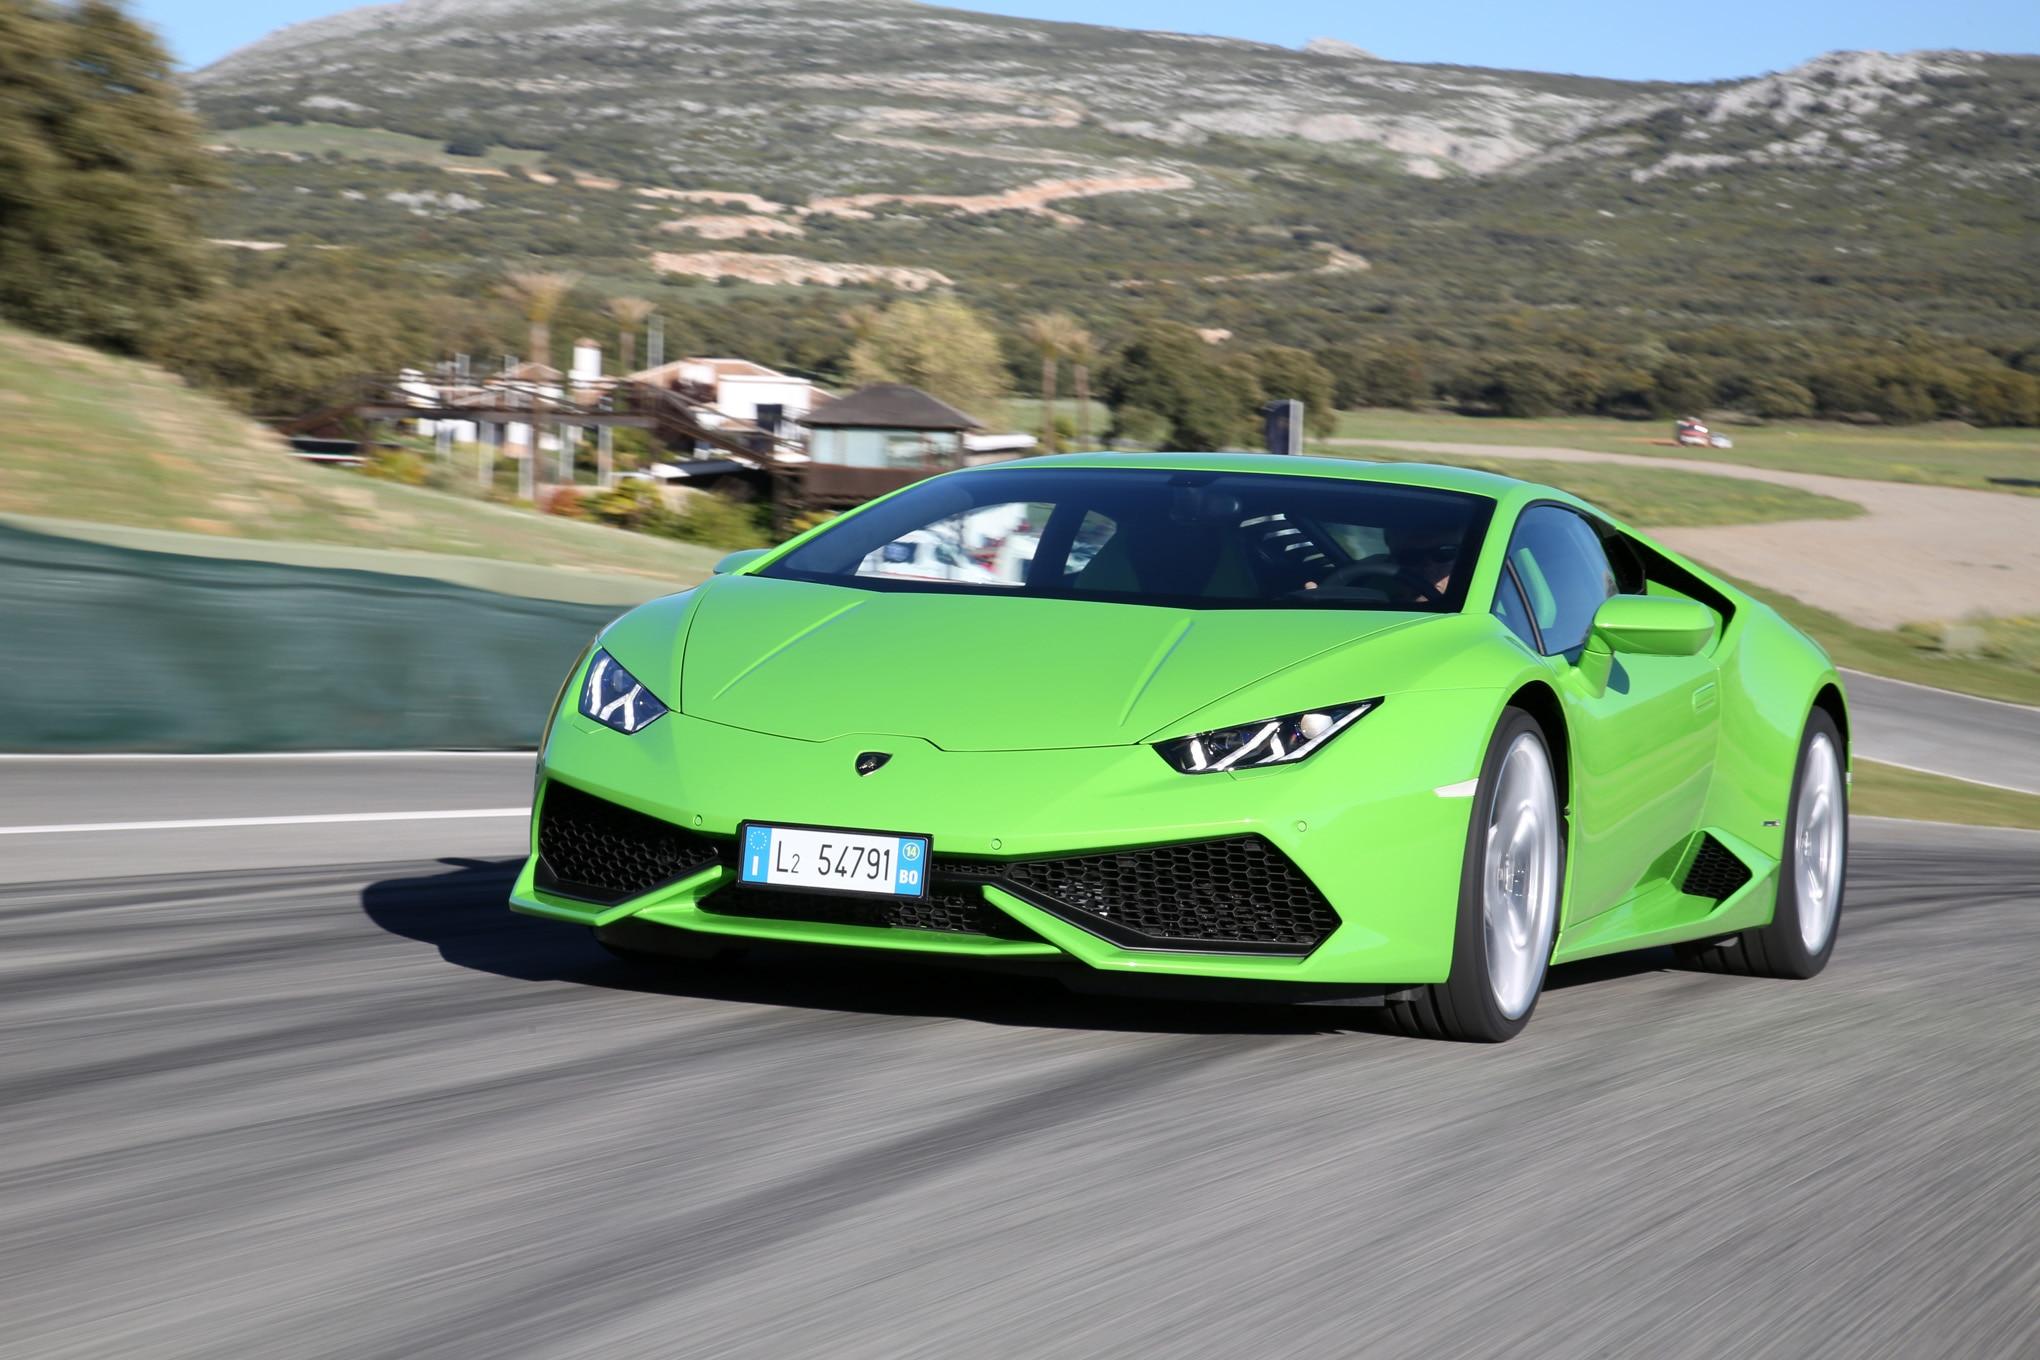 2015-Lamborghini-Huracan-LP-610-4-green-MT-promo Marvelous Lamborghini Huracan Price In Uae Cars Trend